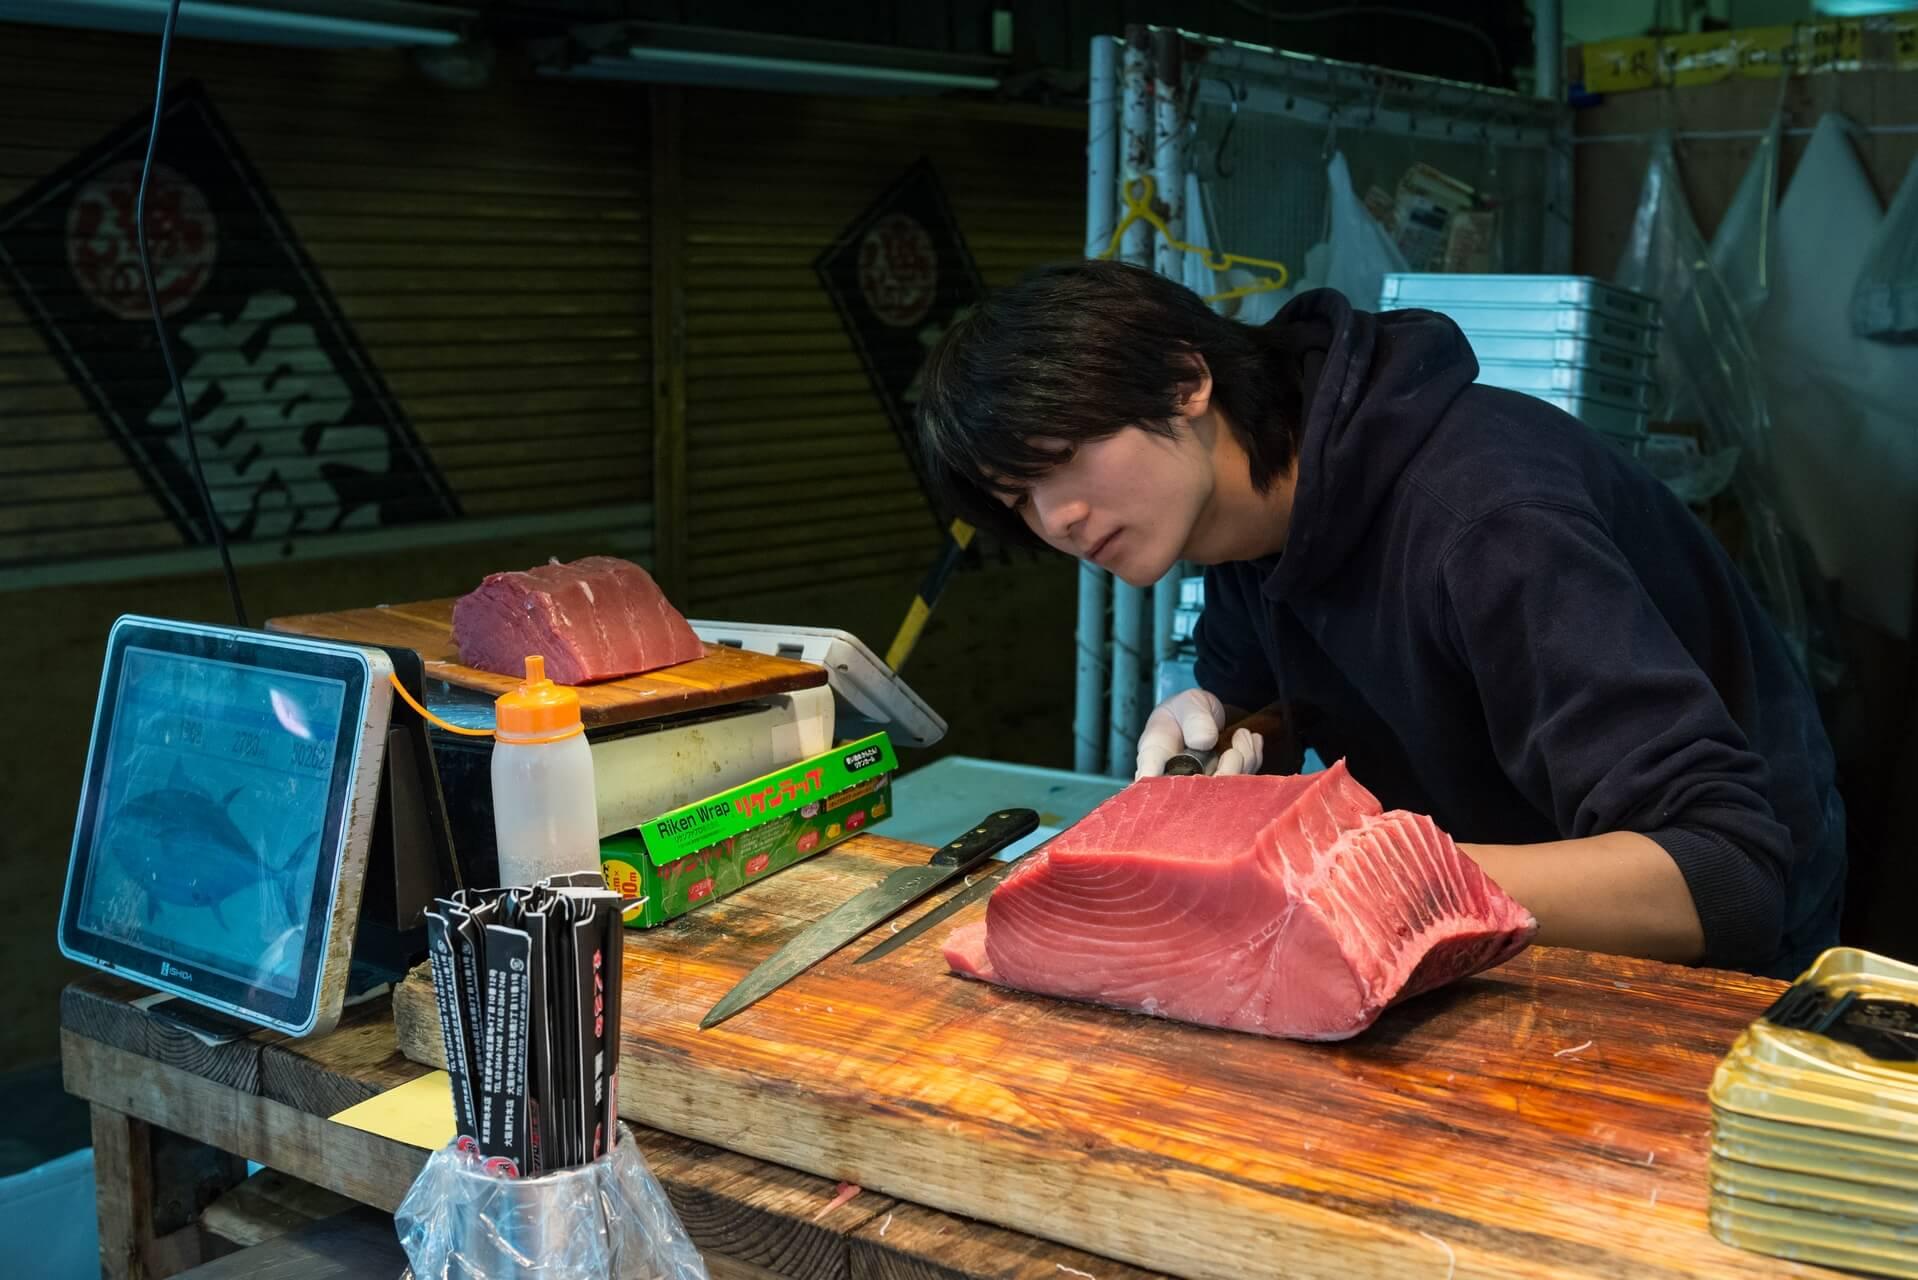 Japan Tokyo Fischmarkt